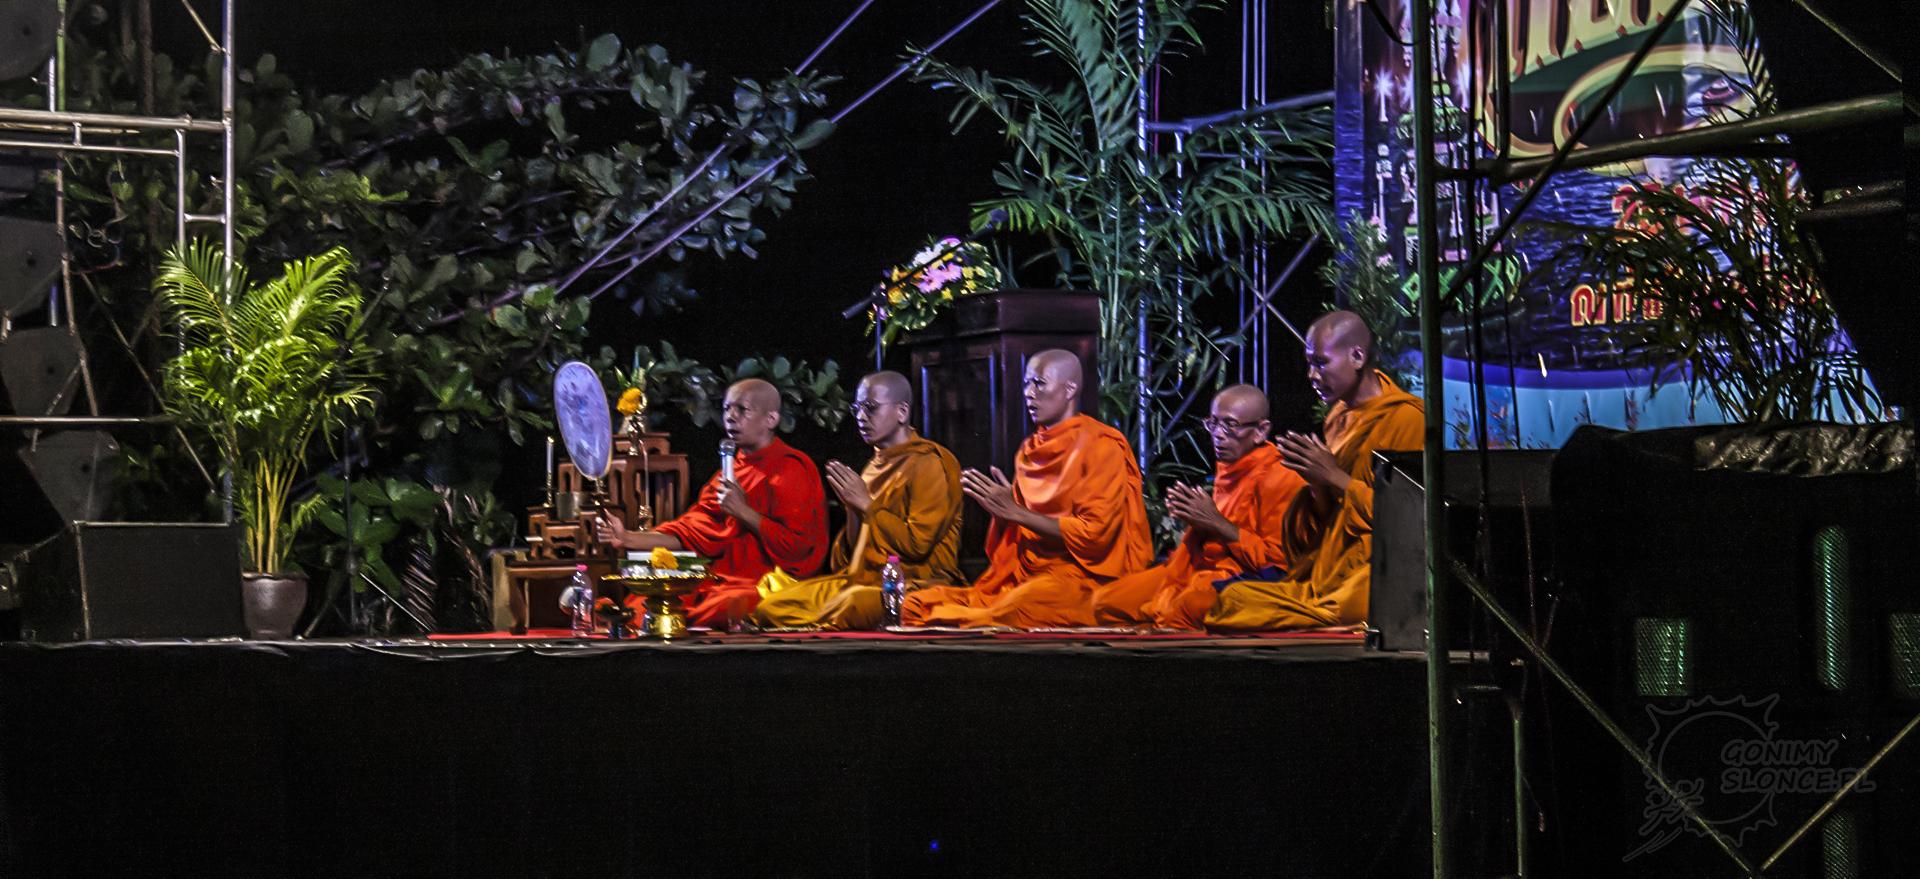 Tajlandia festiwal Loy Krathong - światła i lampiony